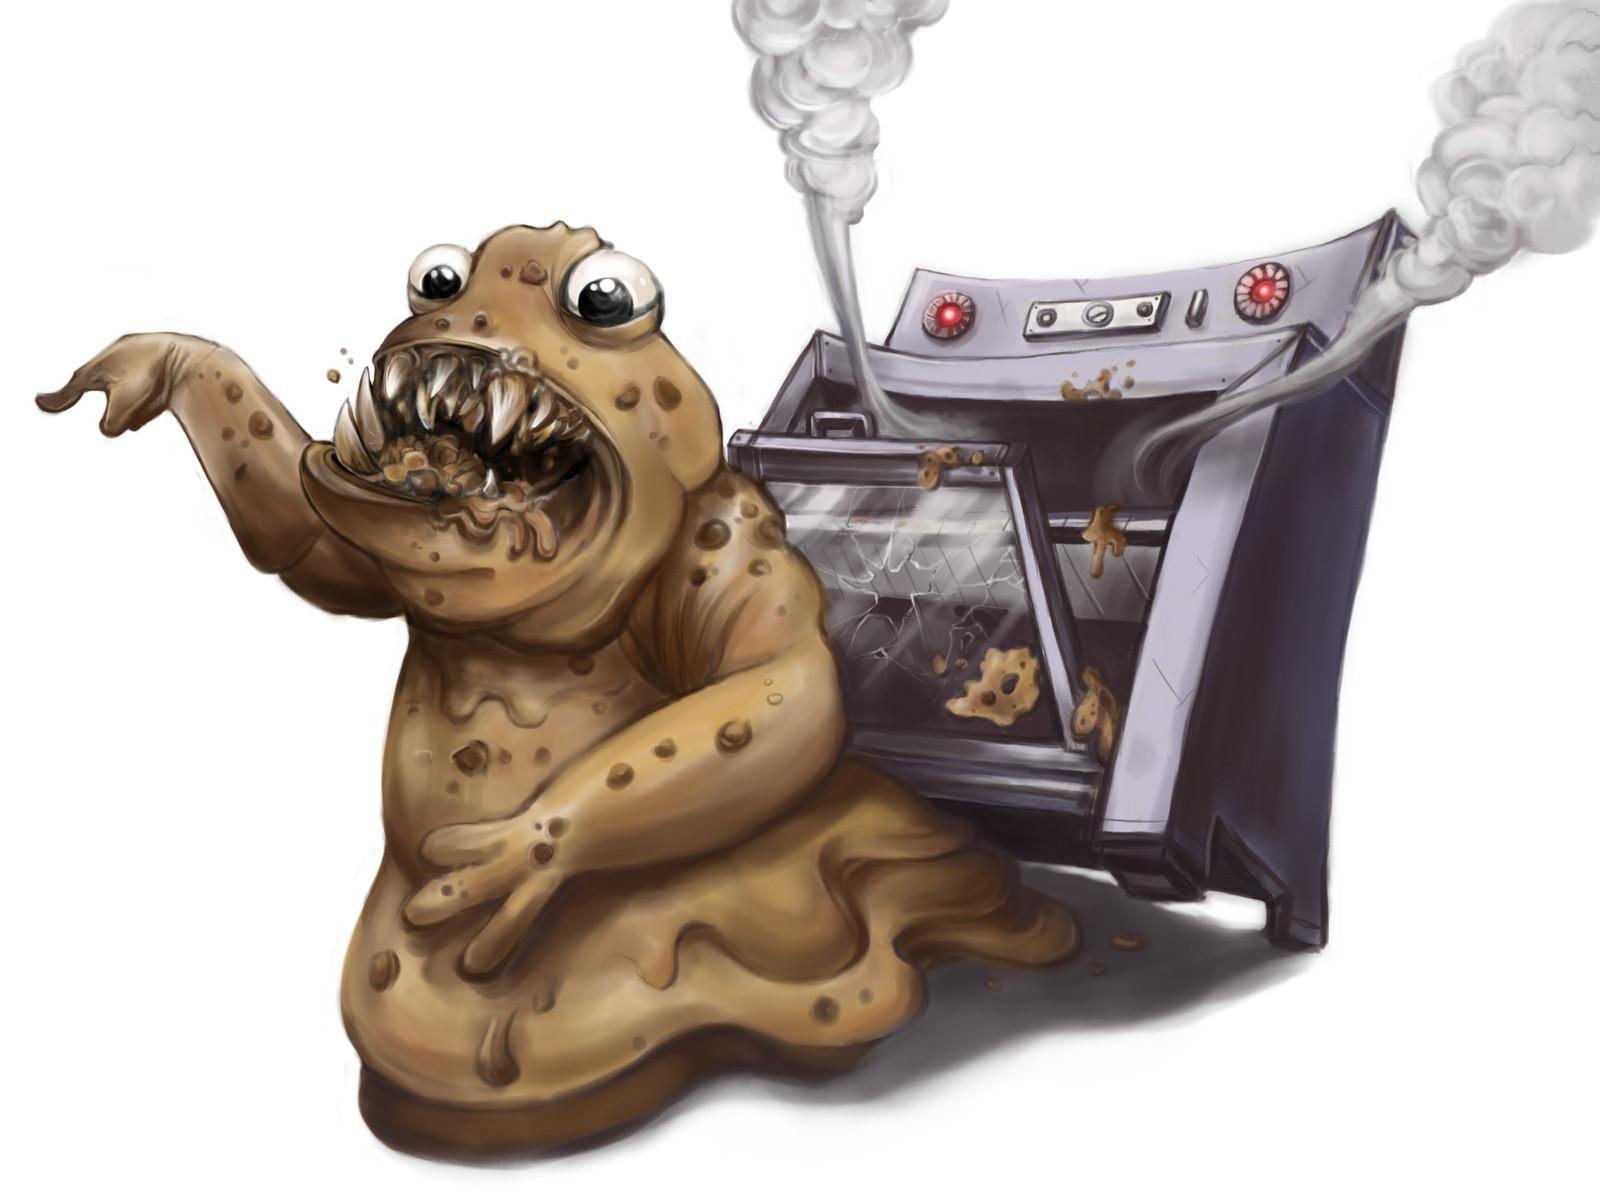 Cookie Dough Monster - Children's Book Illustration